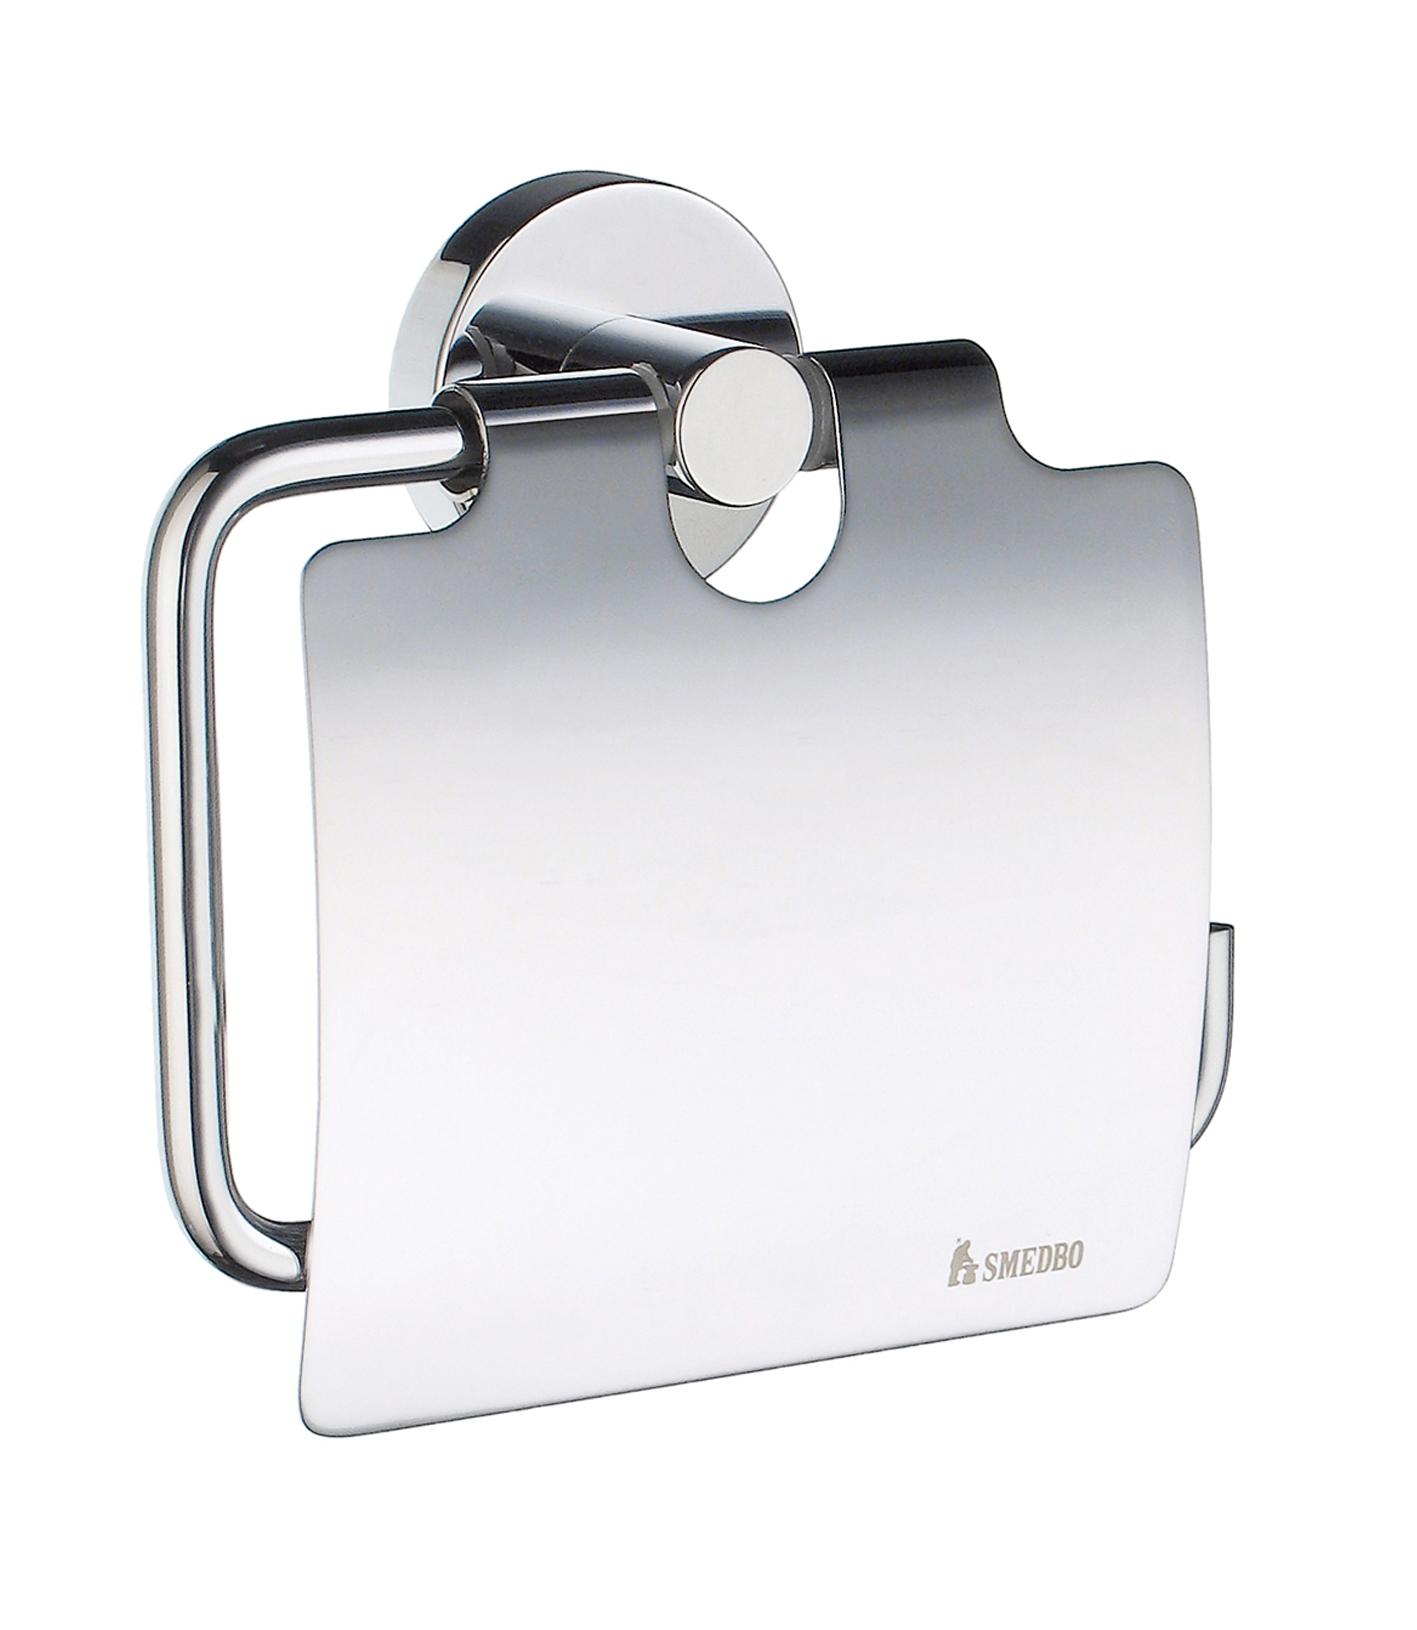 SMEDBO HOME WC-Papierhalter mit Deckel HK3414